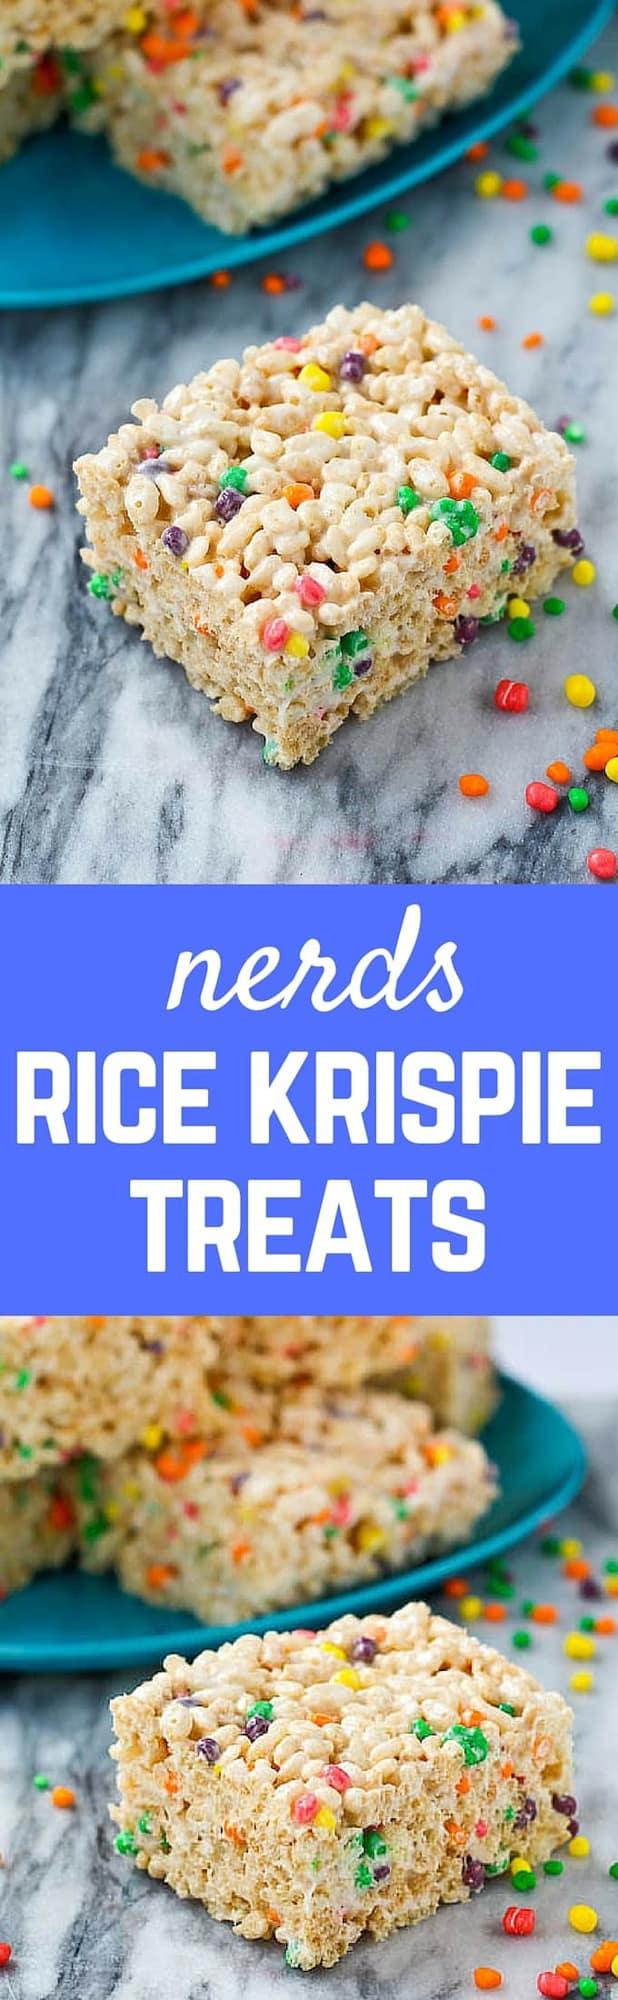 Nerds Rice Krispie Treats - RachelCooks.com